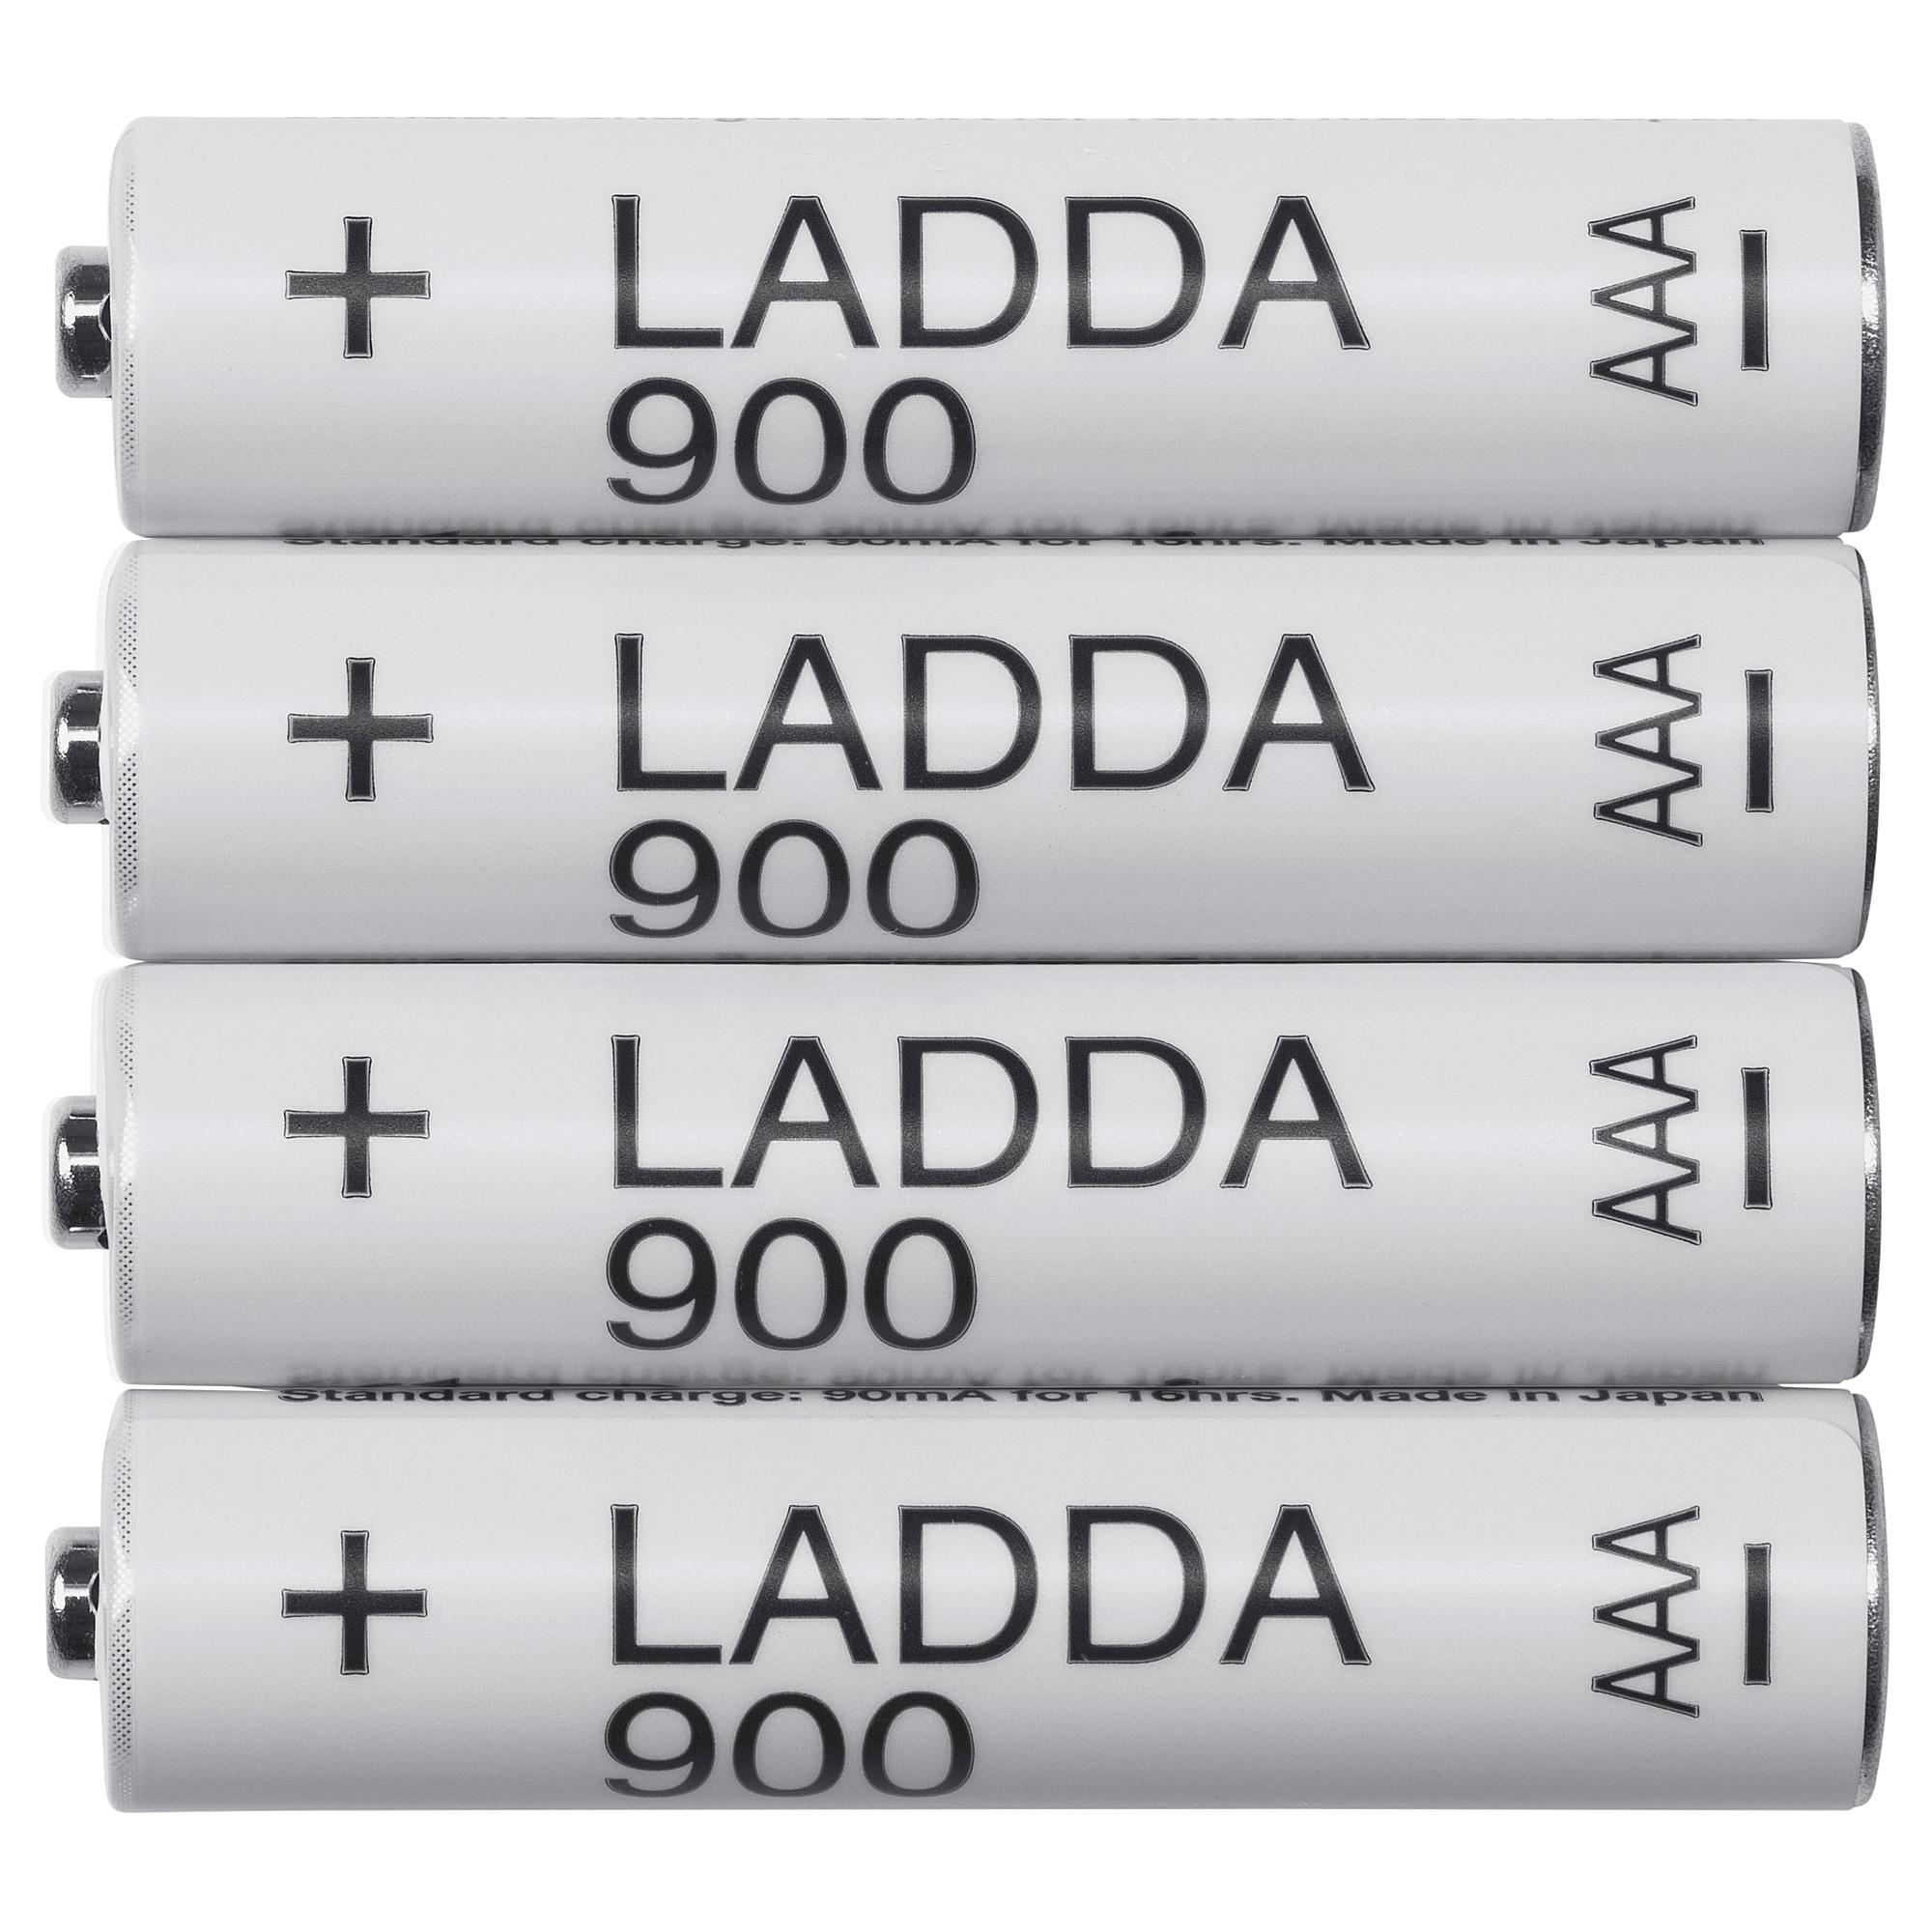 Akumulatorki IKEA LADDA 900mAh AAA 4sztuki @ Allegro